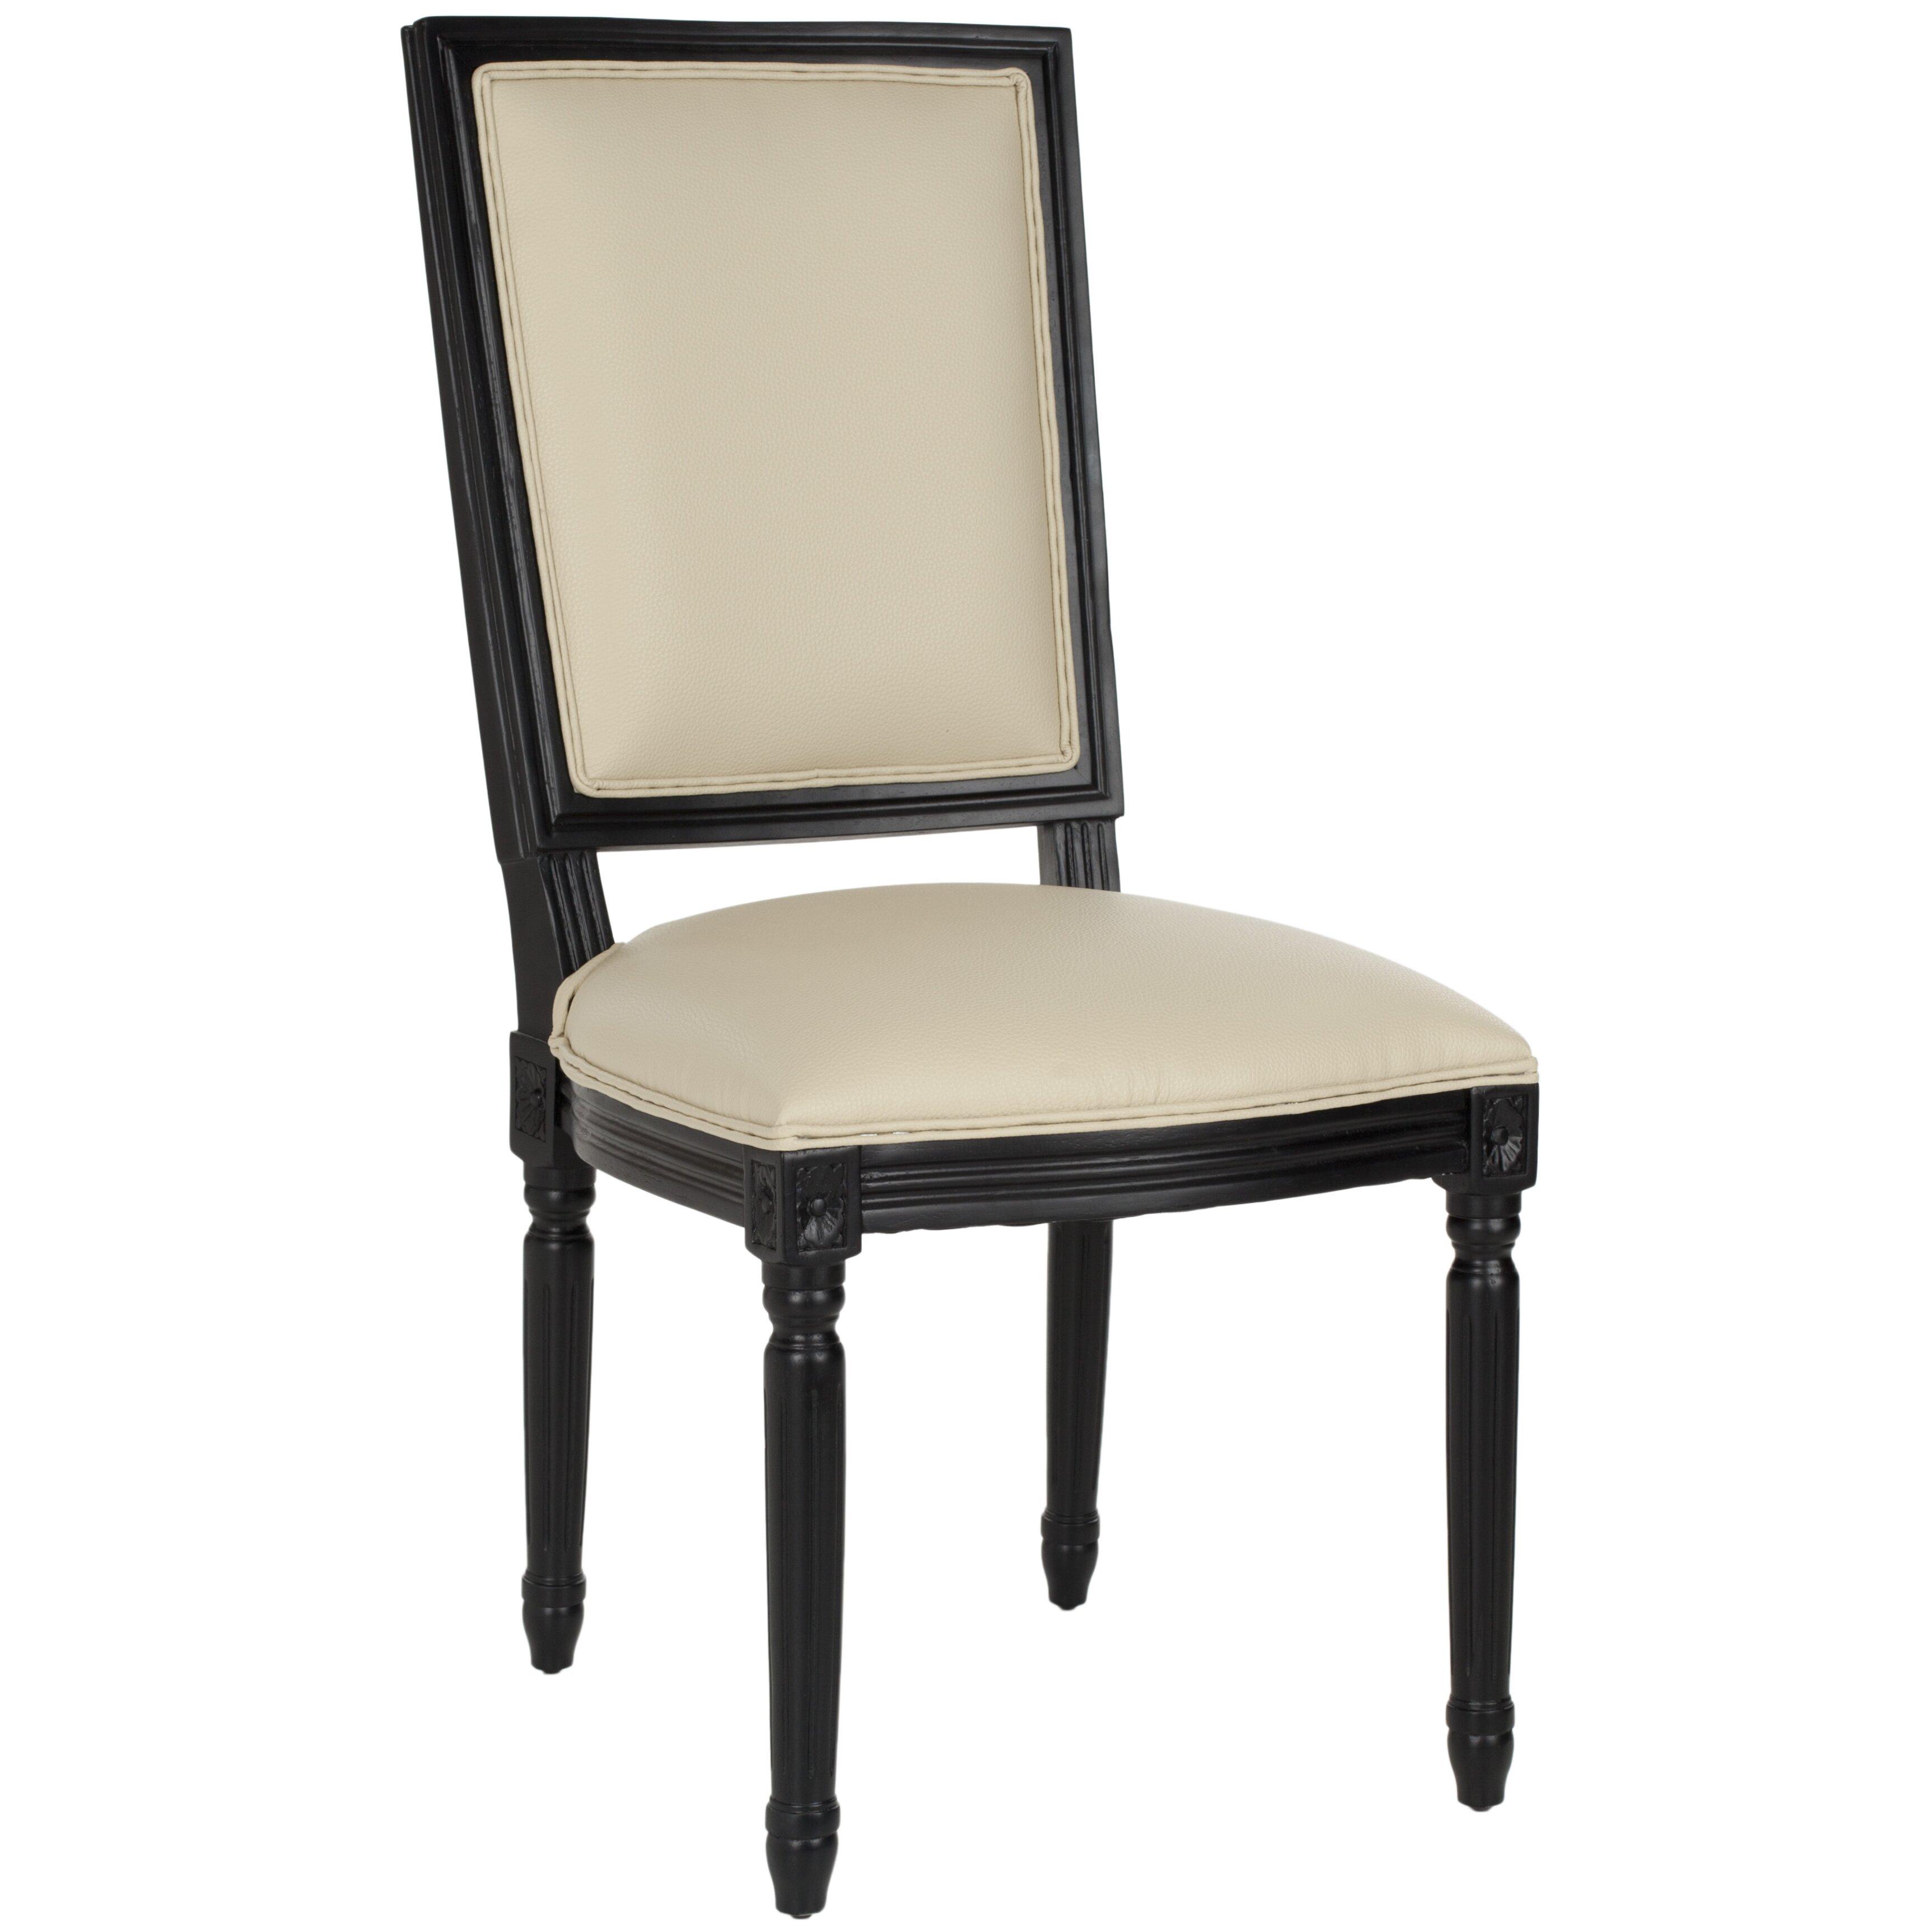 safavieh solid oak upholstered dining chair wayfair uk